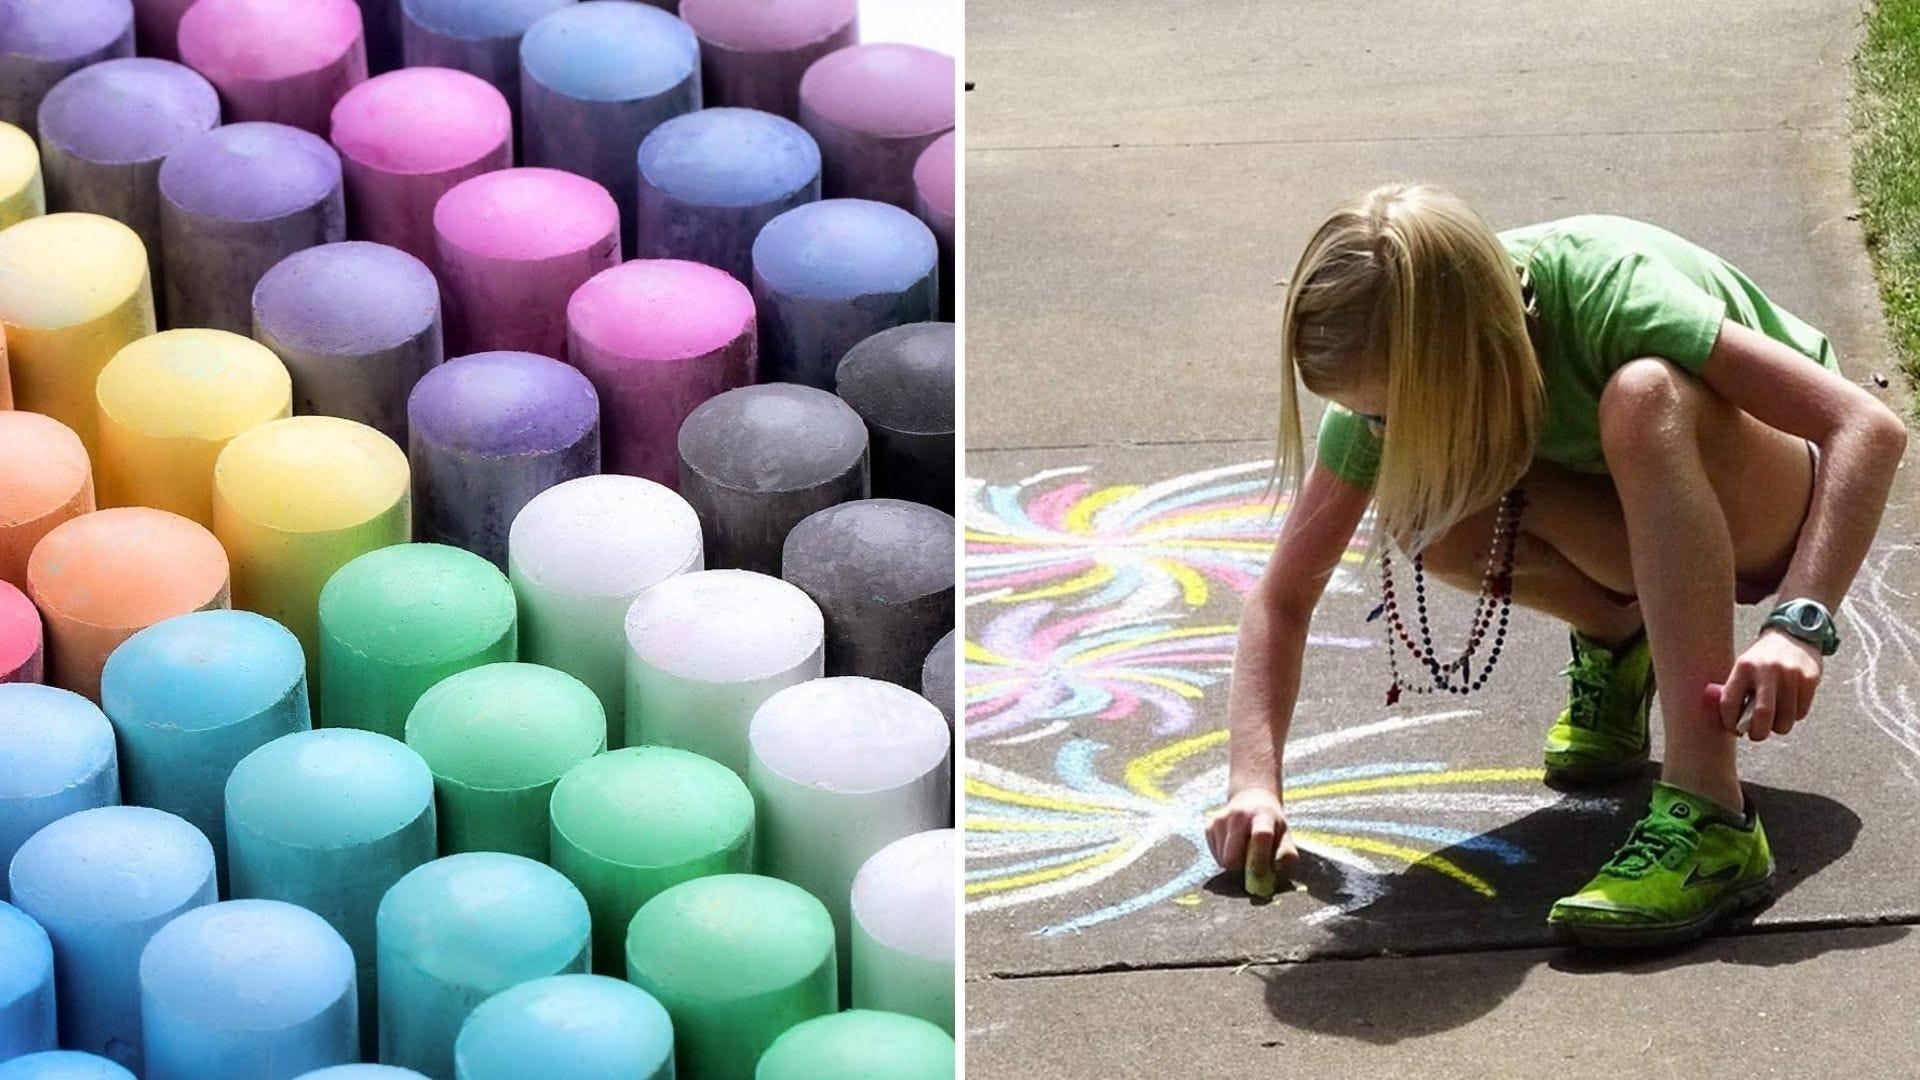 A large kit of sidewalk chalk and a girl draws with sidewalk chalk